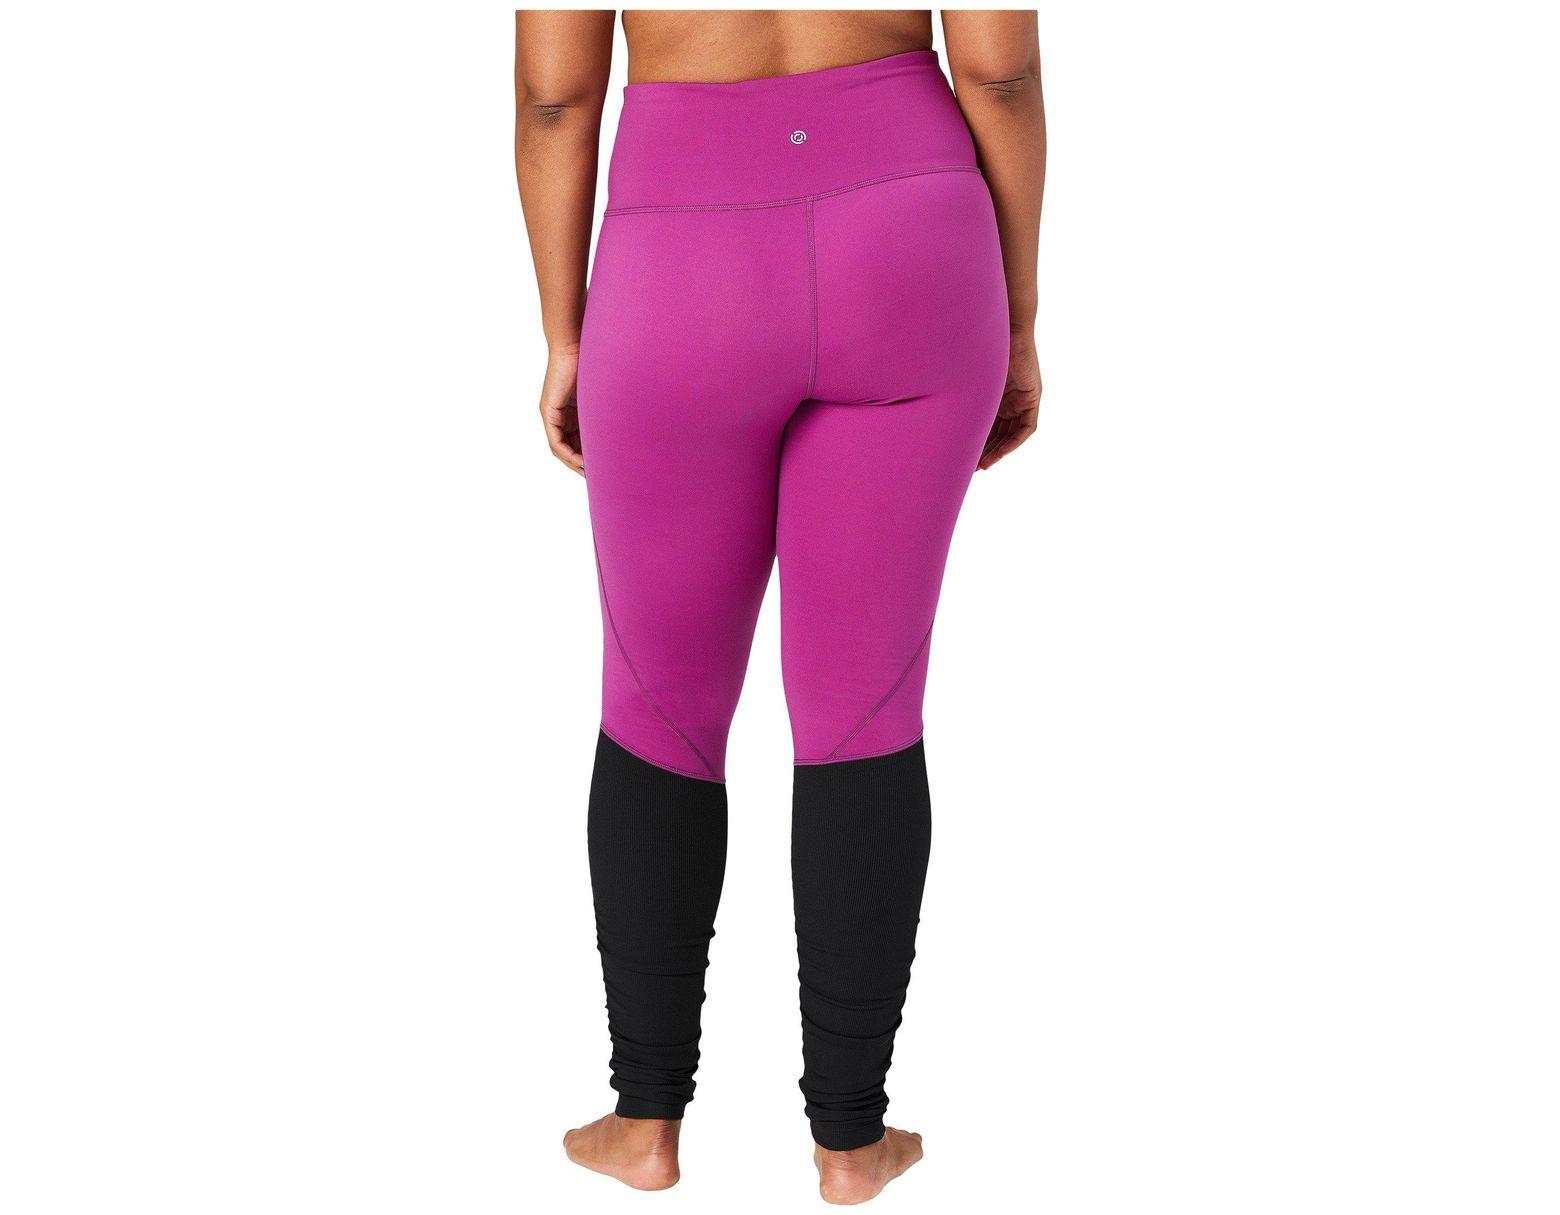 Core 10 Icon Series - The Ballerina Plus Size Yoga Leggings in ...